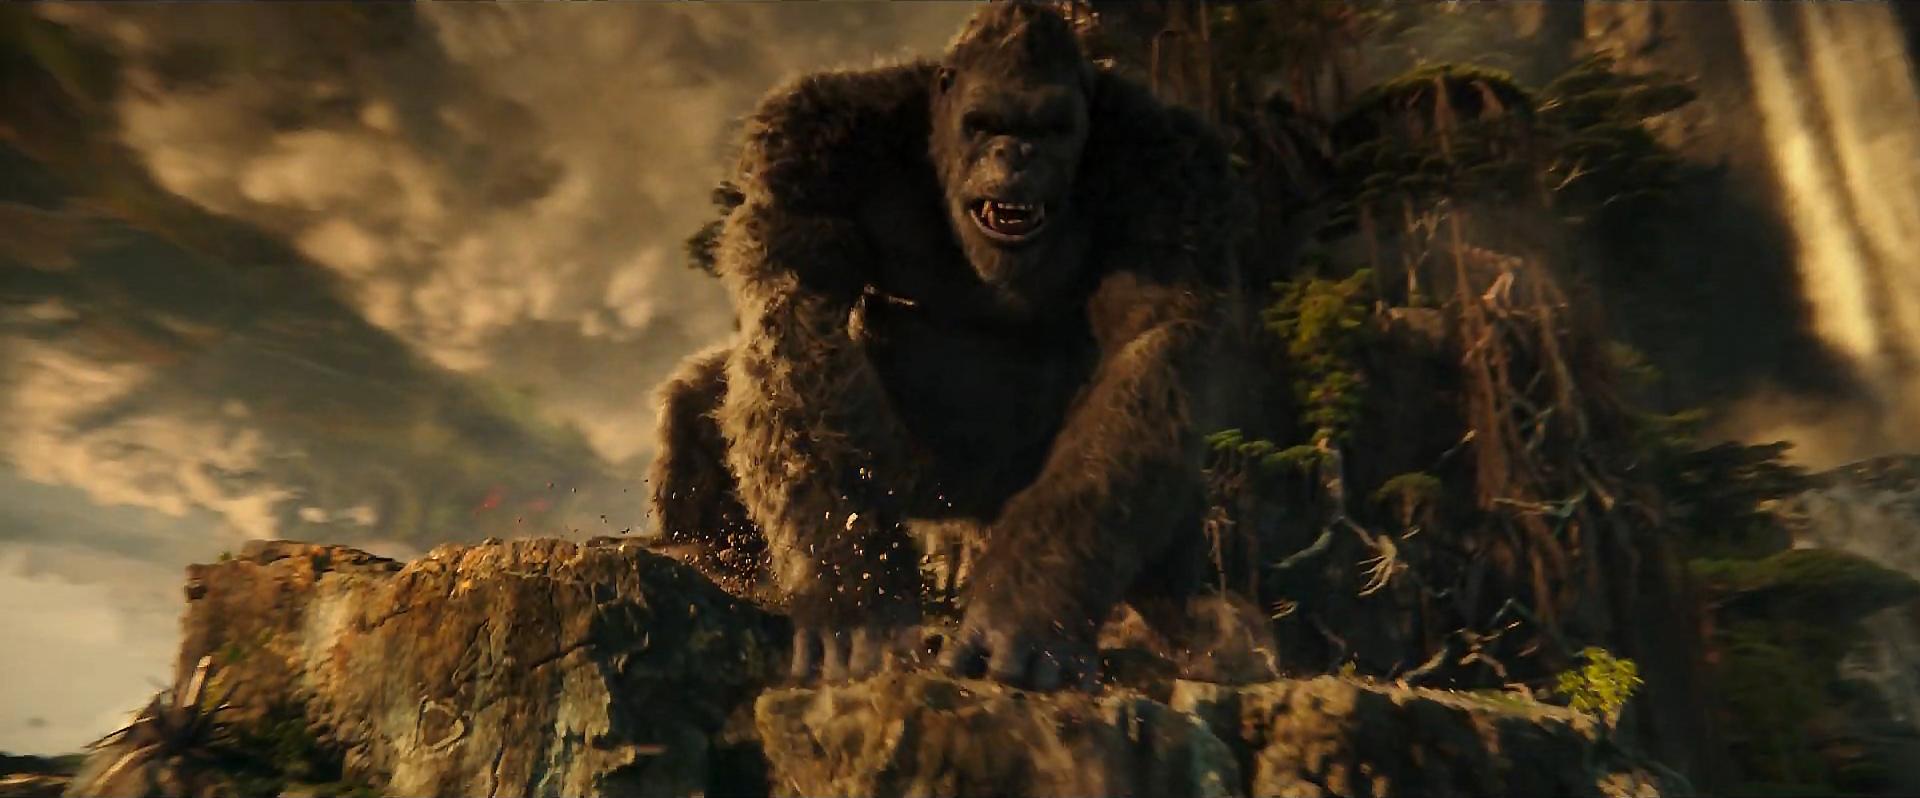 Godzilla vs Kong Trailer Still 60 - Kong Smash